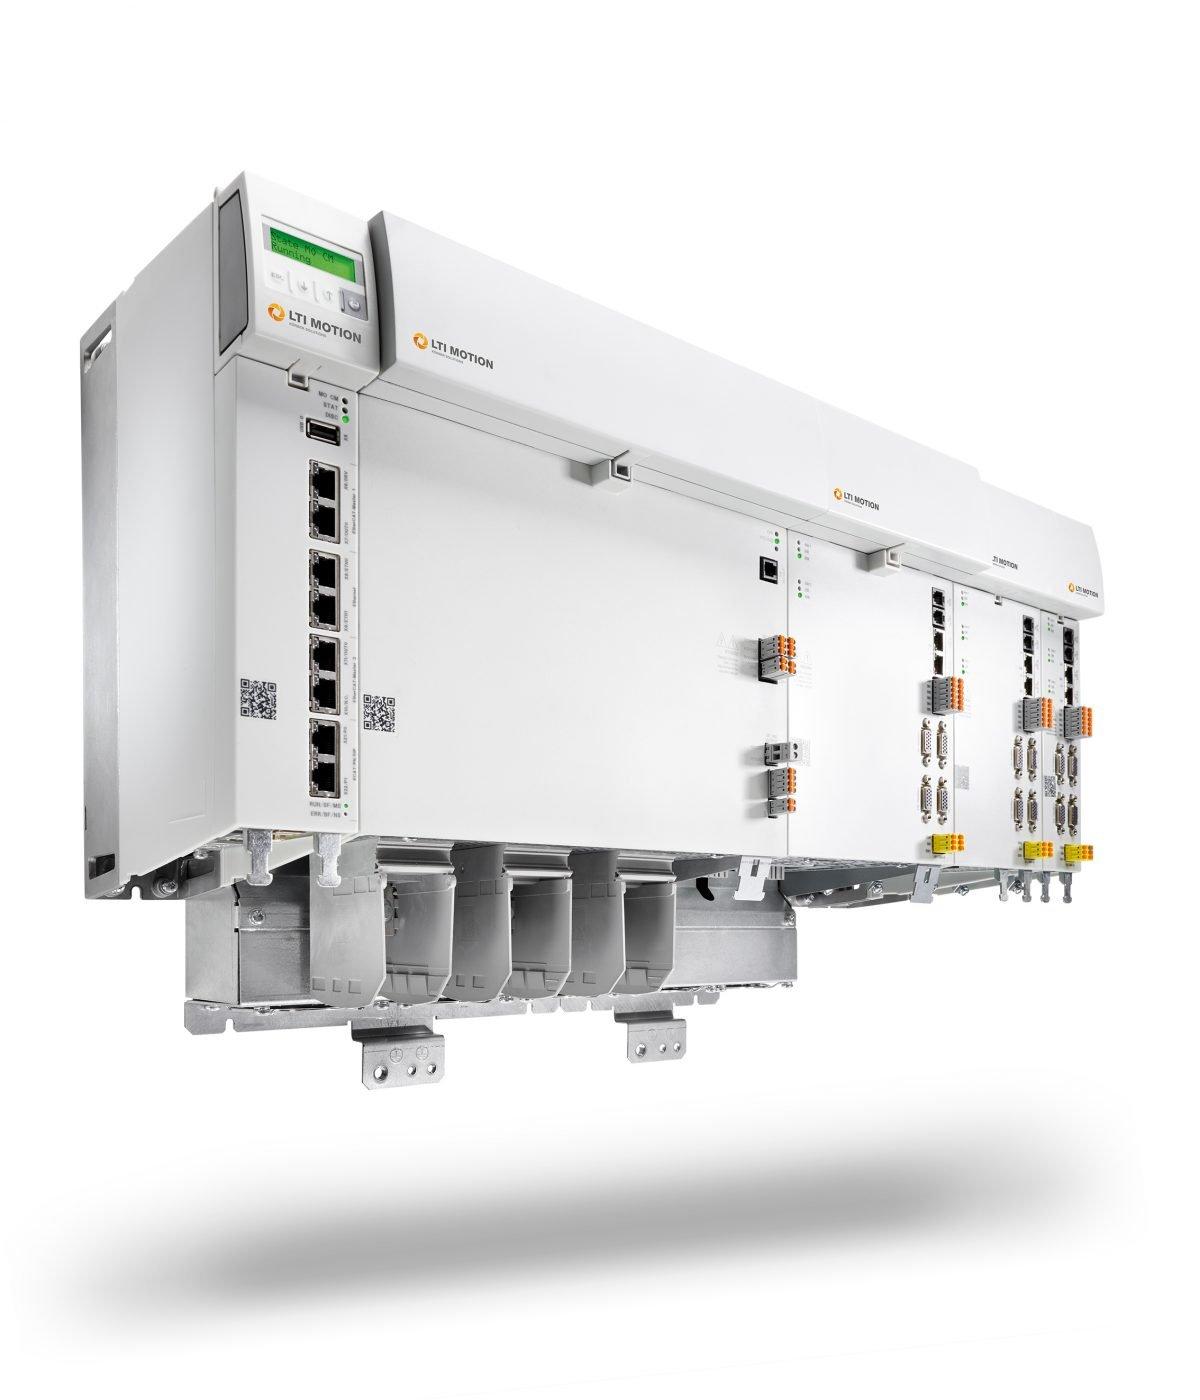 SPS IPC DrivesKompakte Automatisierungslösung steuert kombinierte Achsen dynamisch